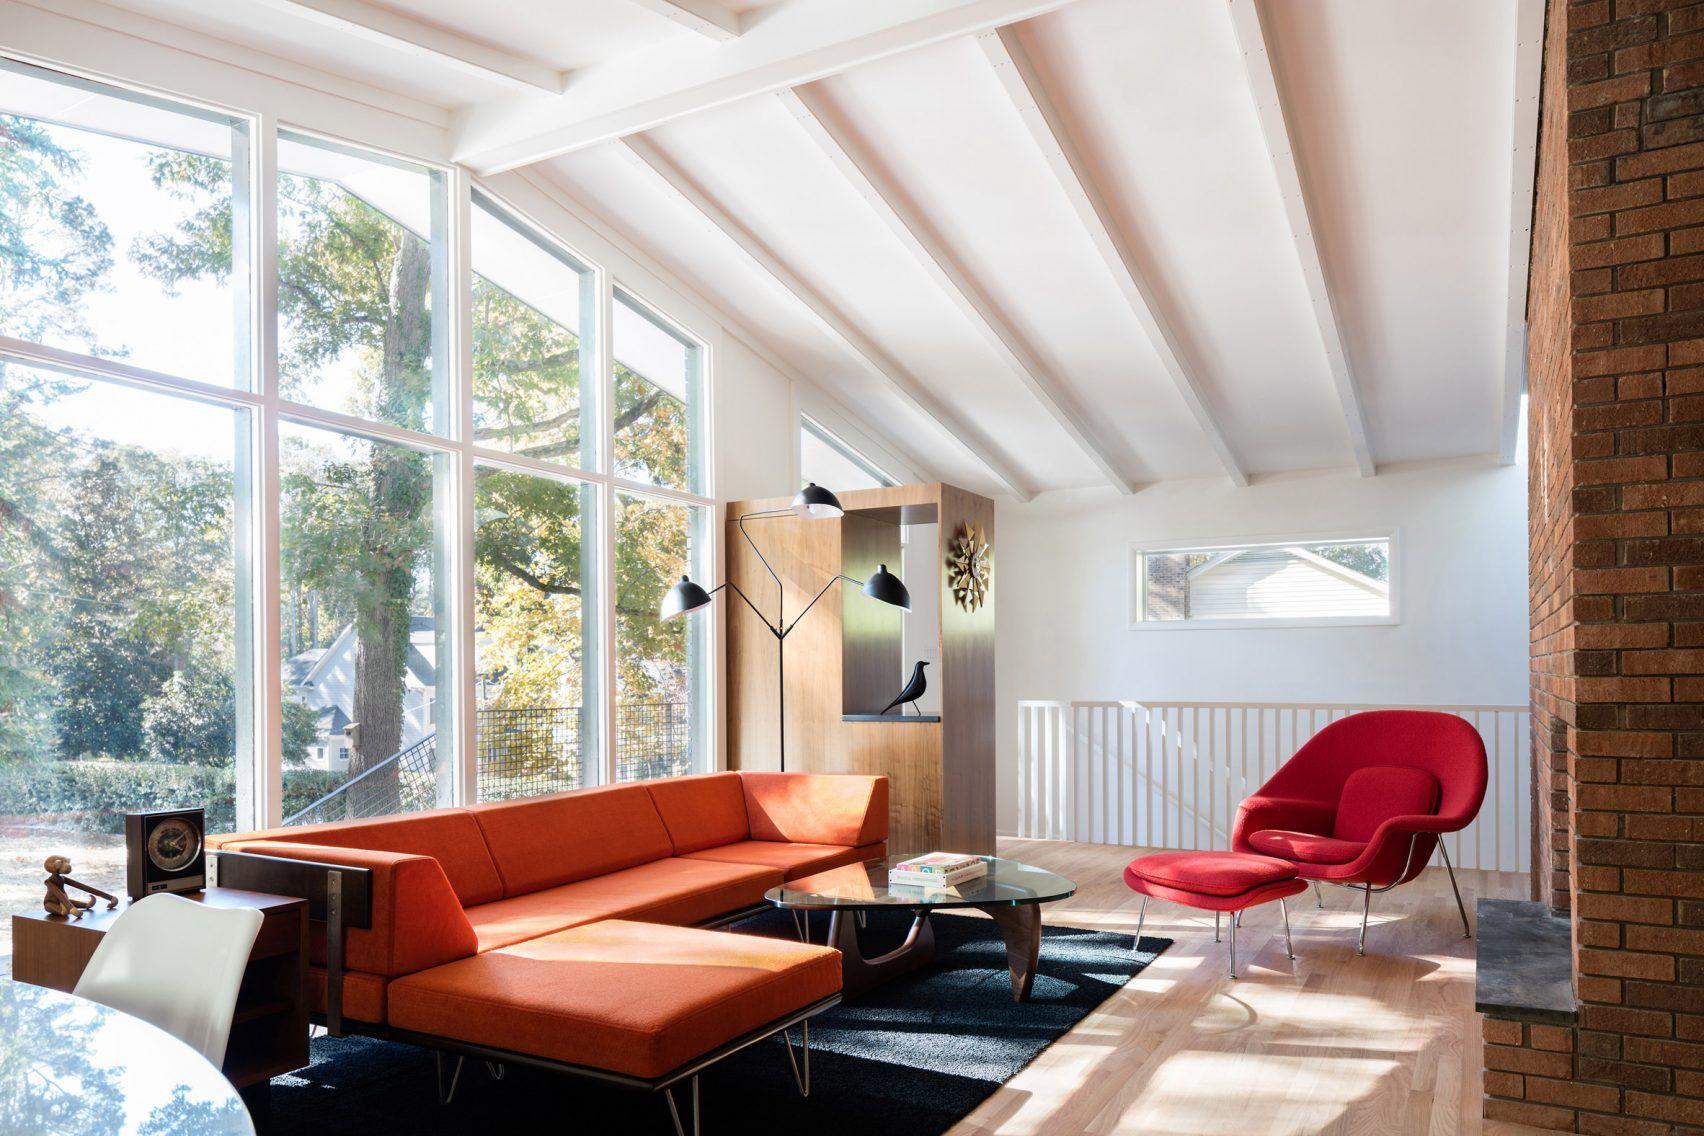 In Situ Studio revives midcentury modern home in North Carolina